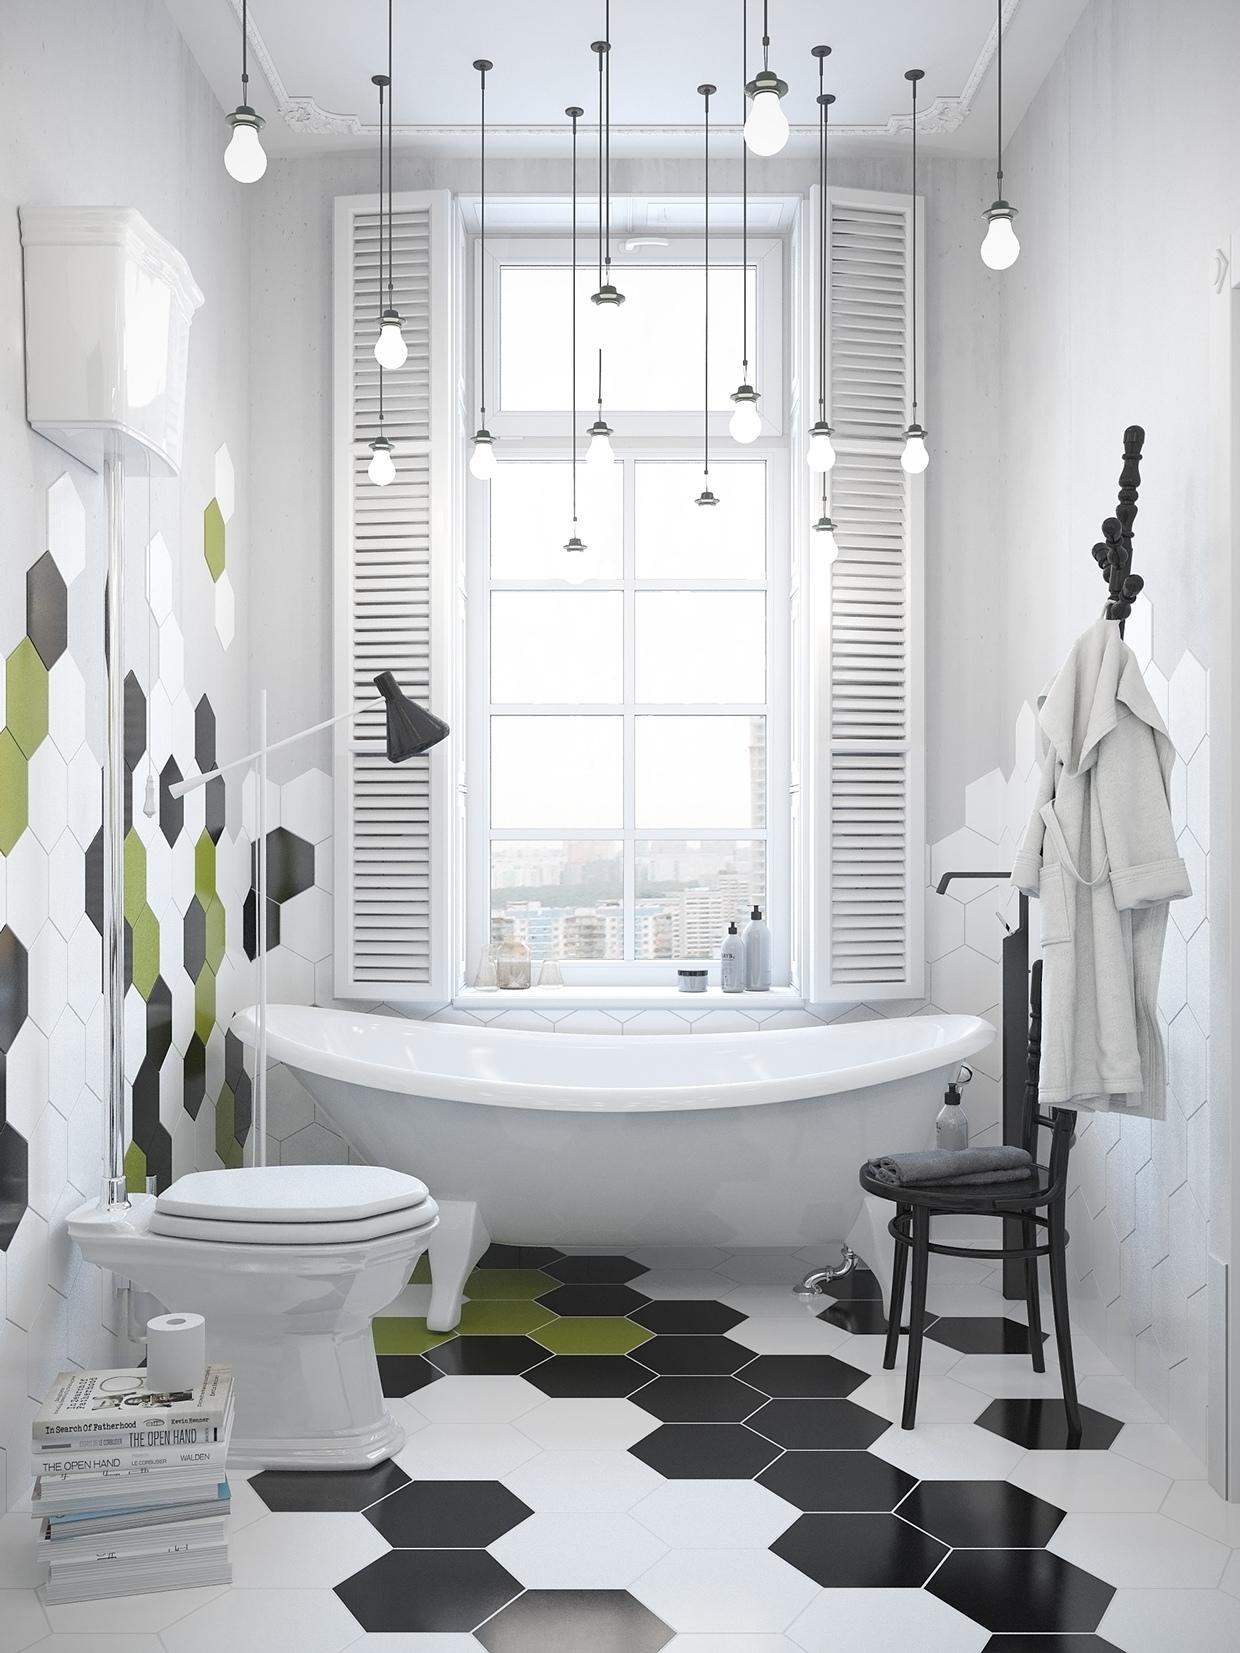 Scandinavian Bathroom Design Ideas With White Color Shade ... on White Bathroom Design Ideas  id=97421